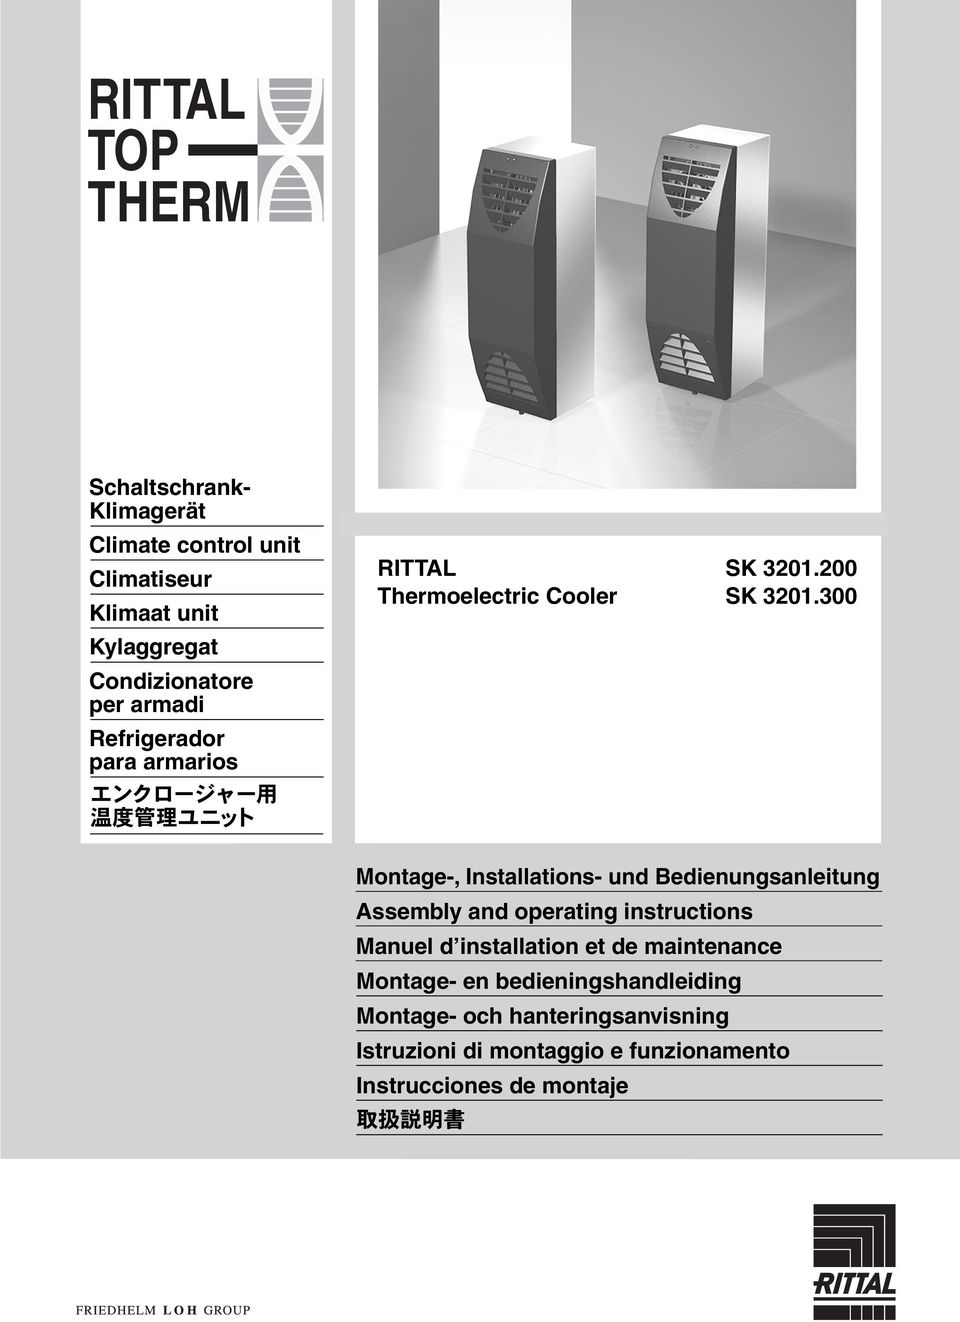 Klimagerät Black Friday Euromac Ac2400 Eurom Ac2400 Klimaanlage